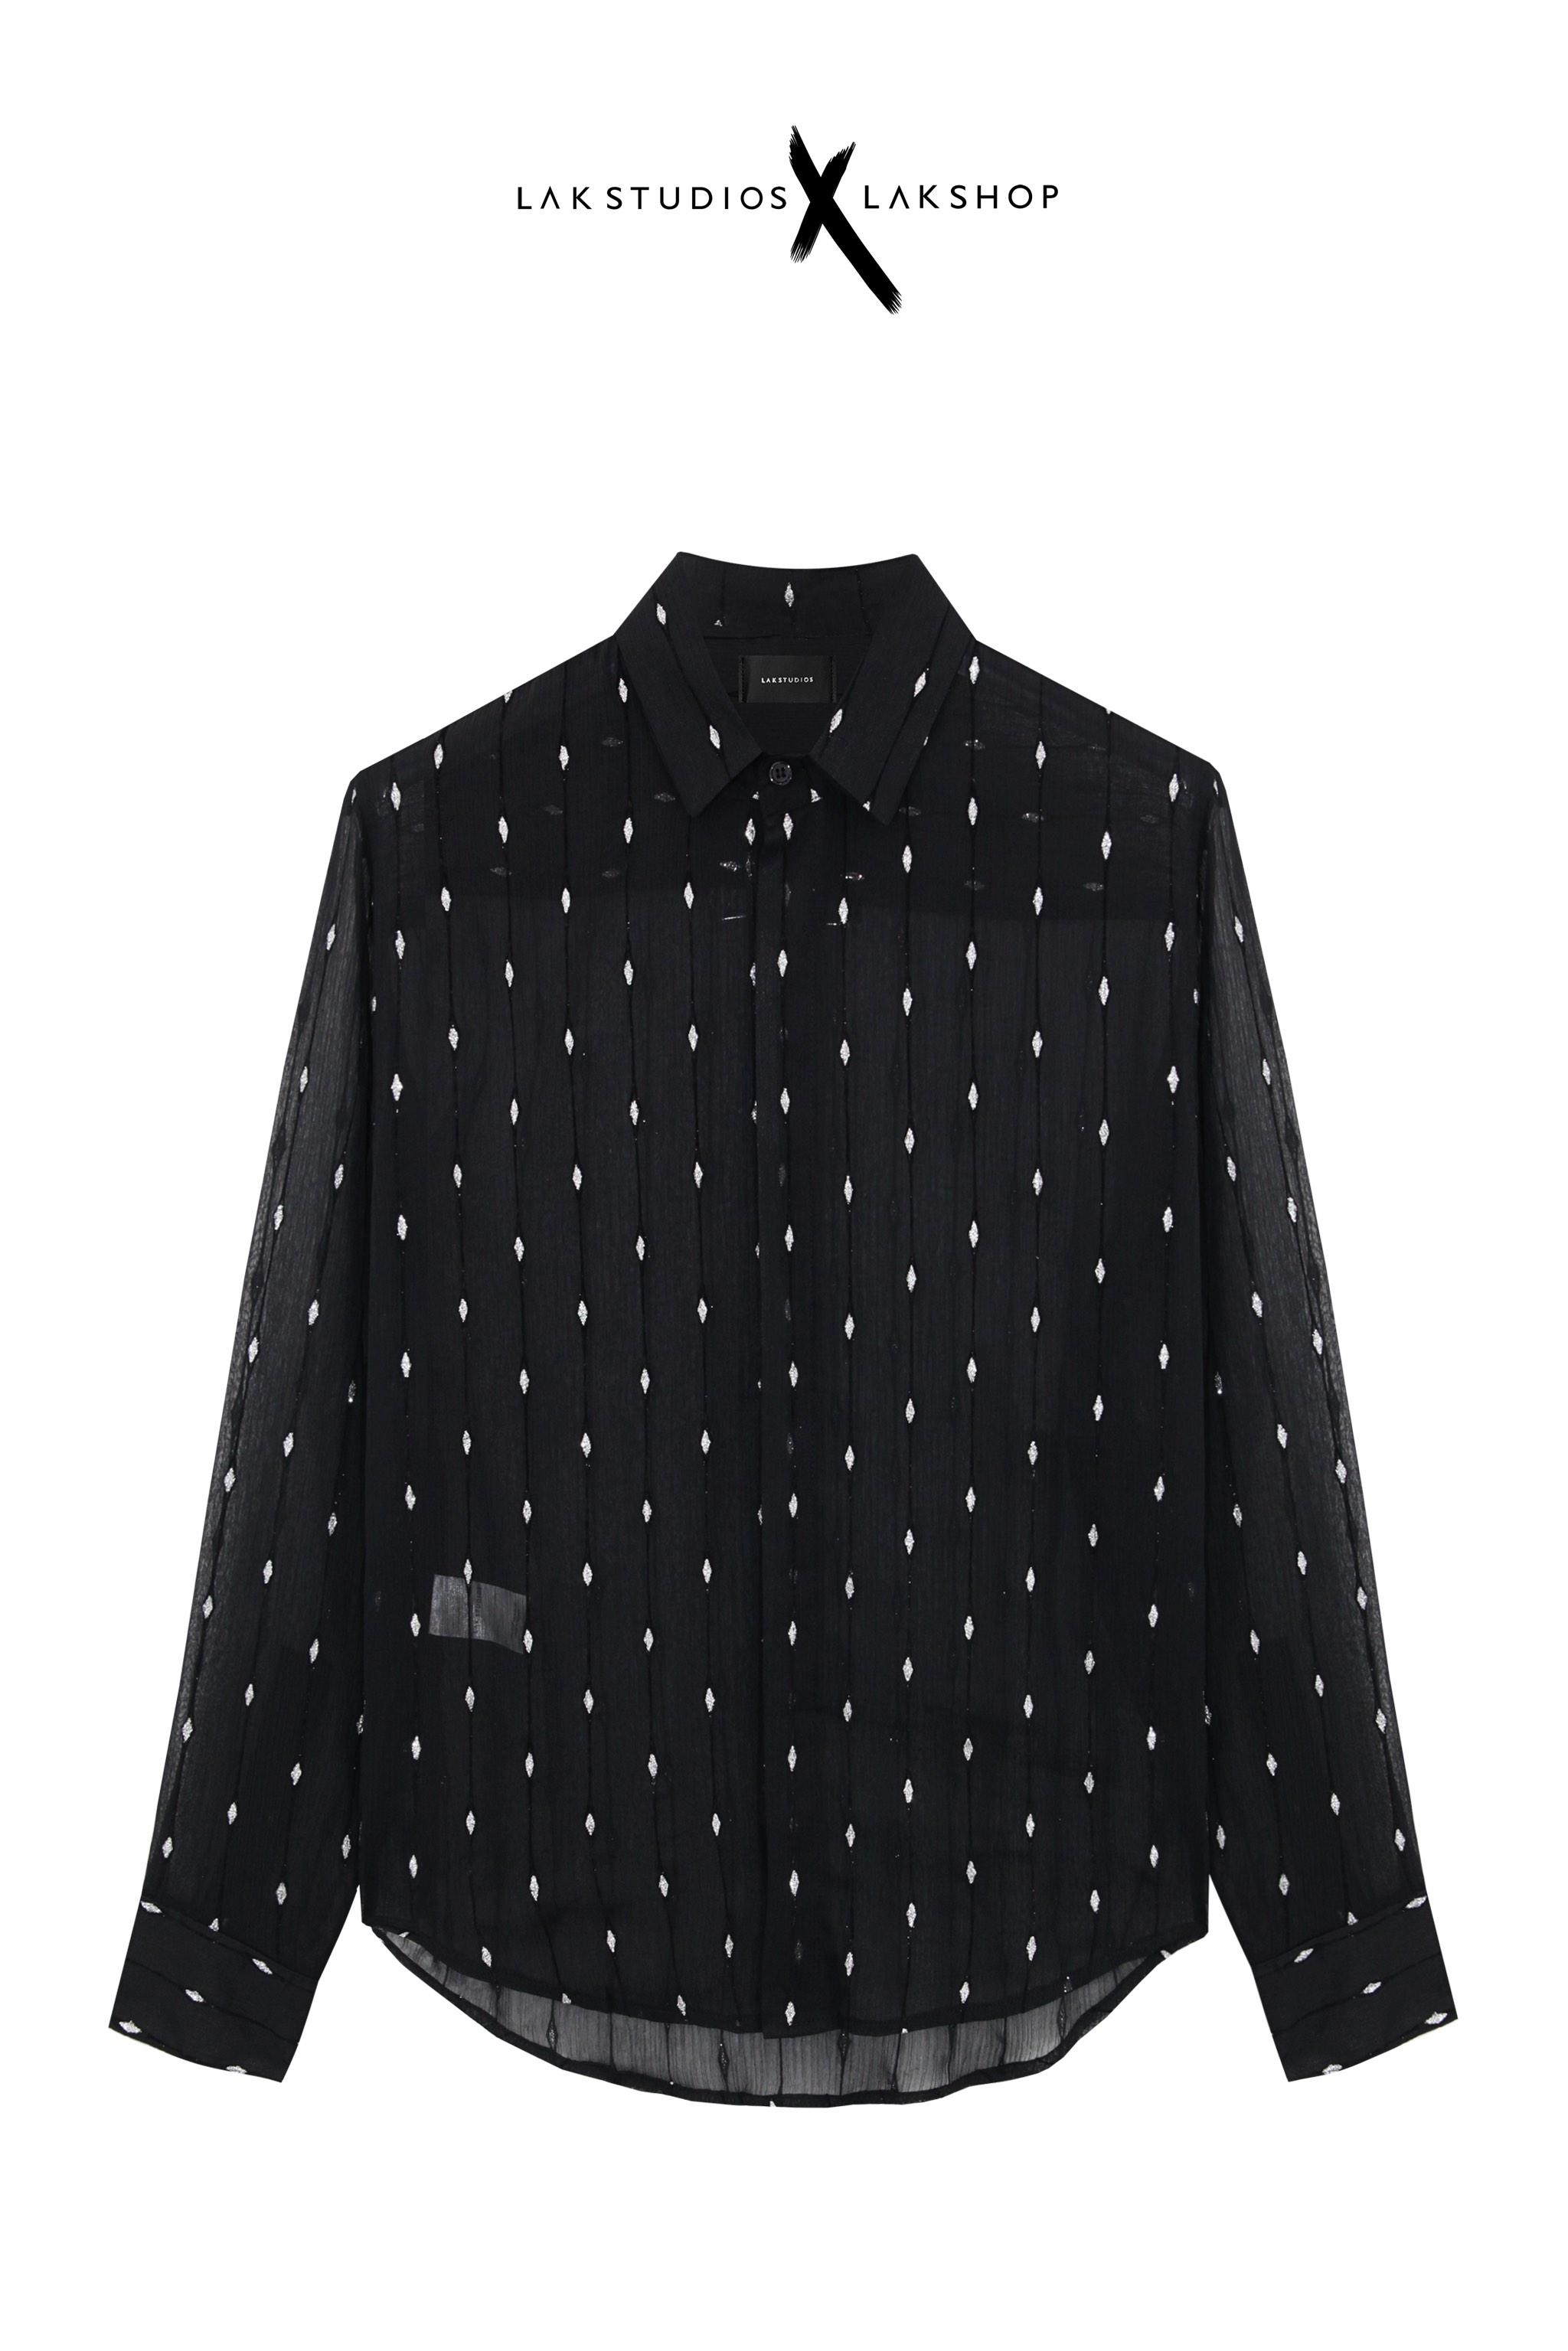 Louis Vuitton x Nigo Squared LV Logo Black Sweatshirt